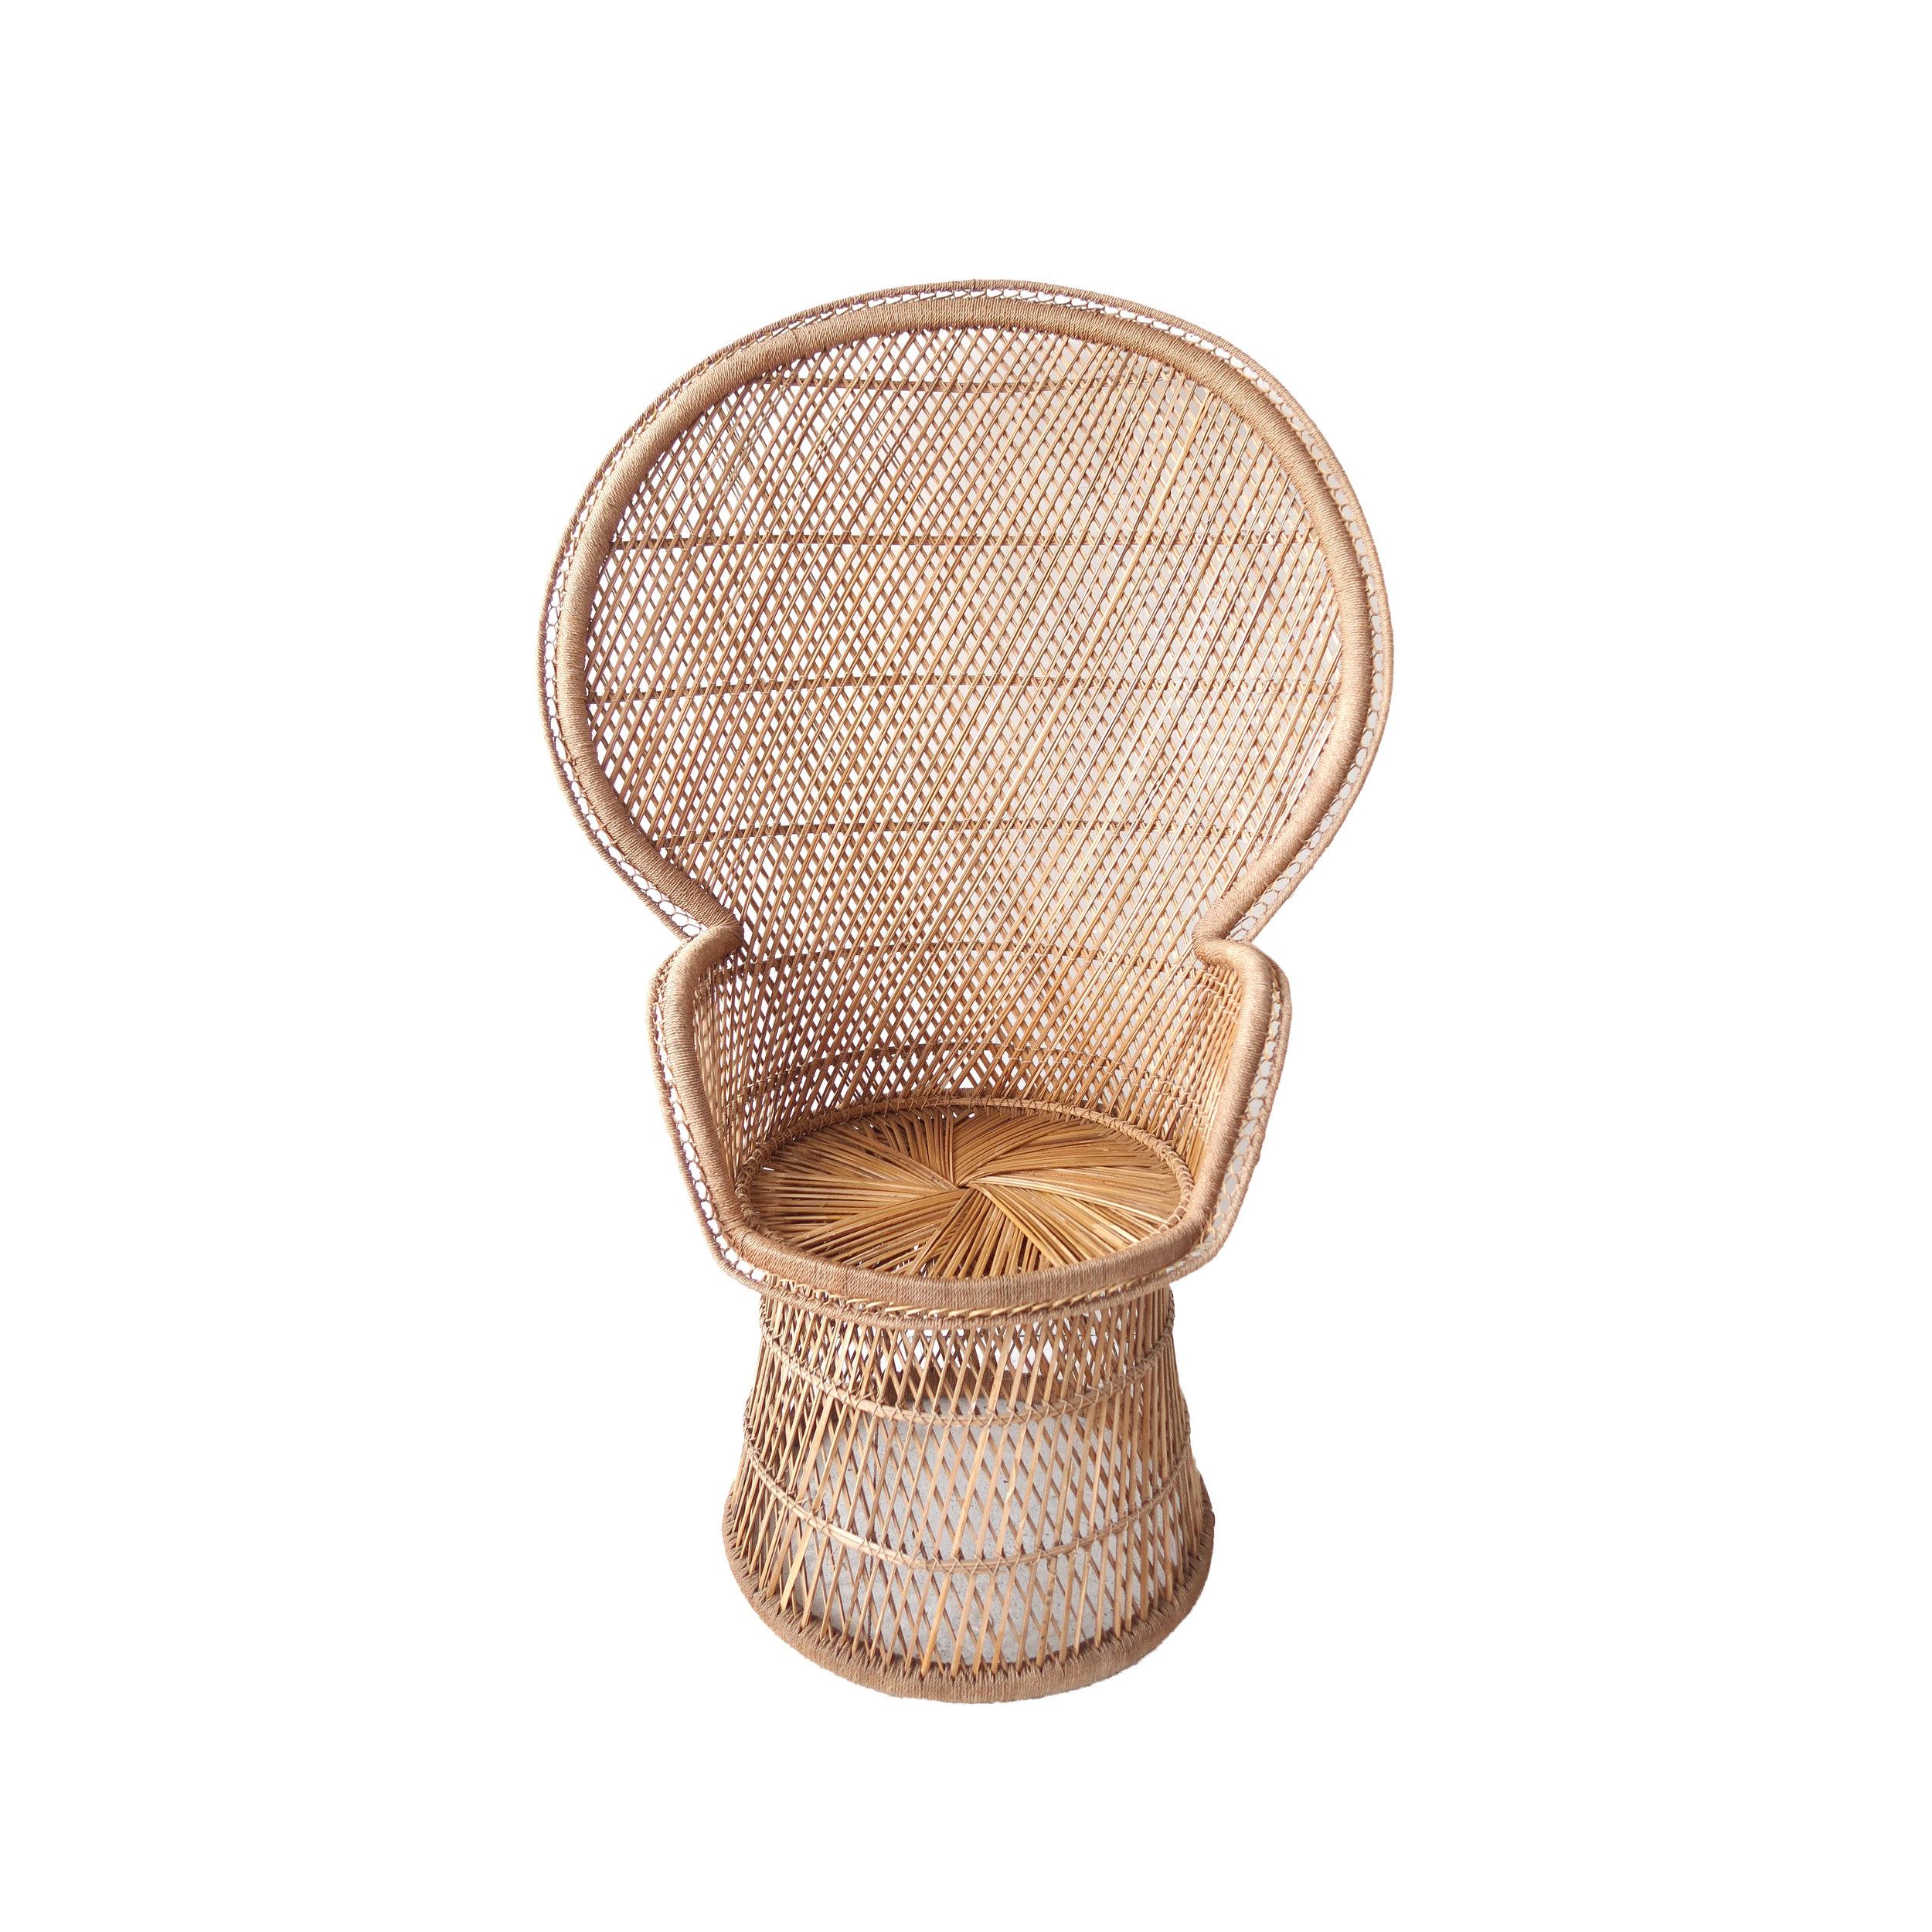 vintage fan peacock chair copy.jpg